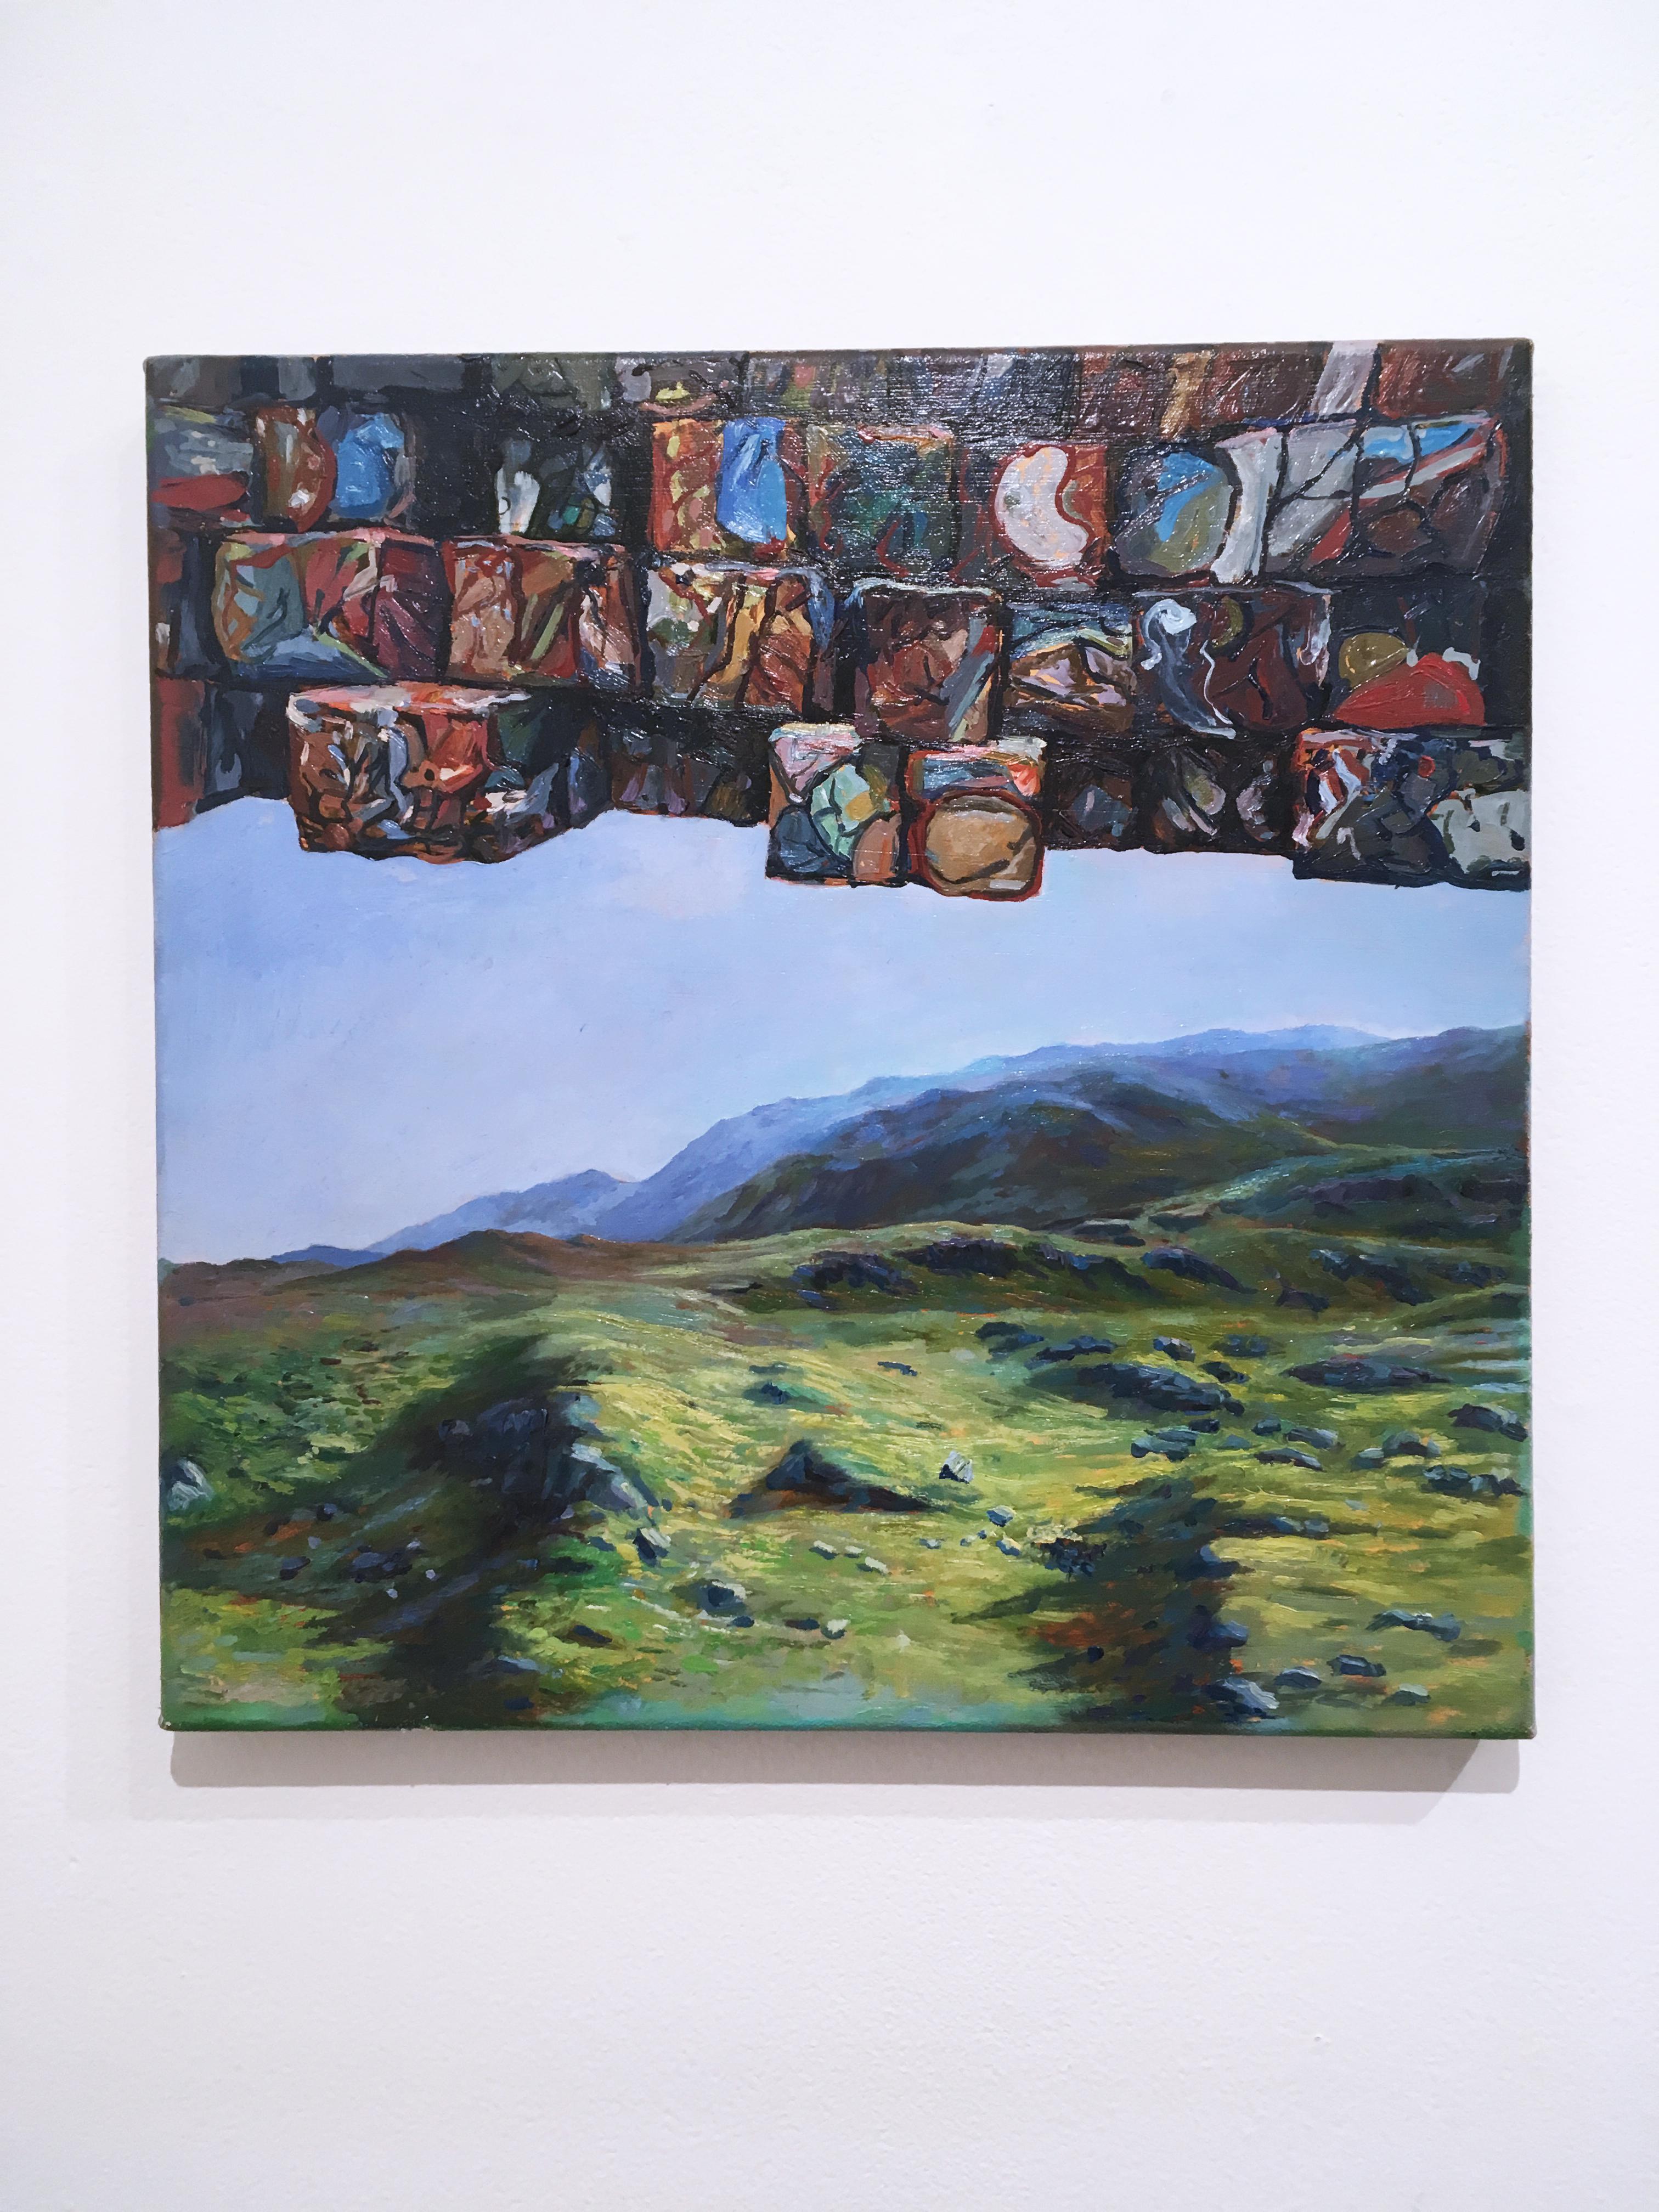 Crushed Oil Cans, surrealist, figurative, landscape, oil on linen, 2015